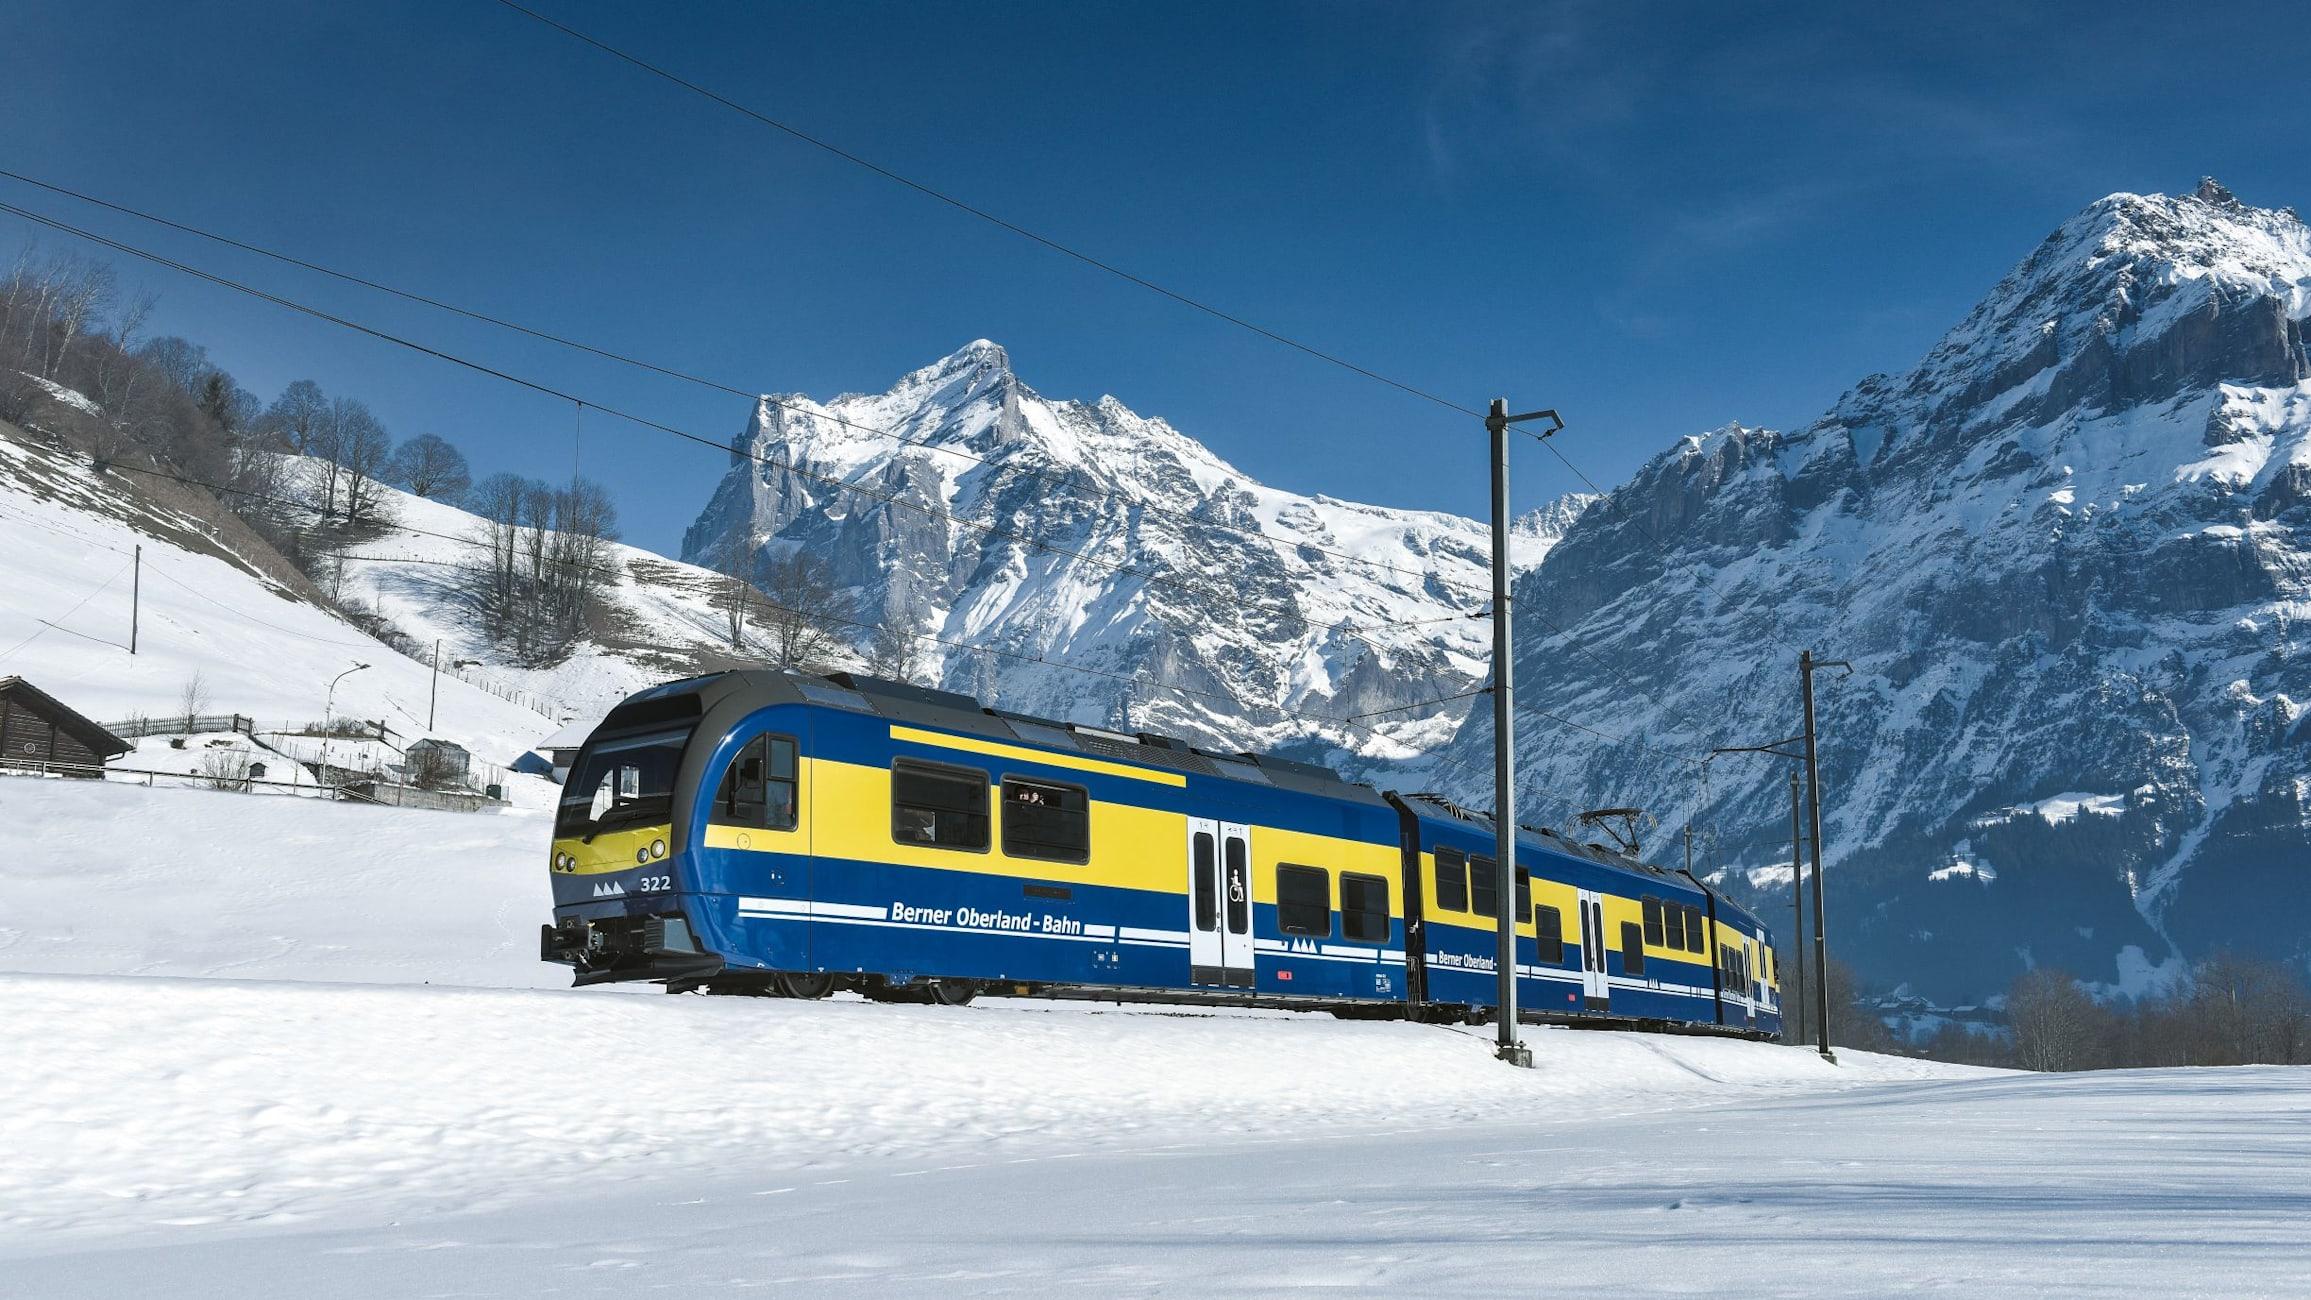 Berner oberlandbahn wetterhorn winter kl